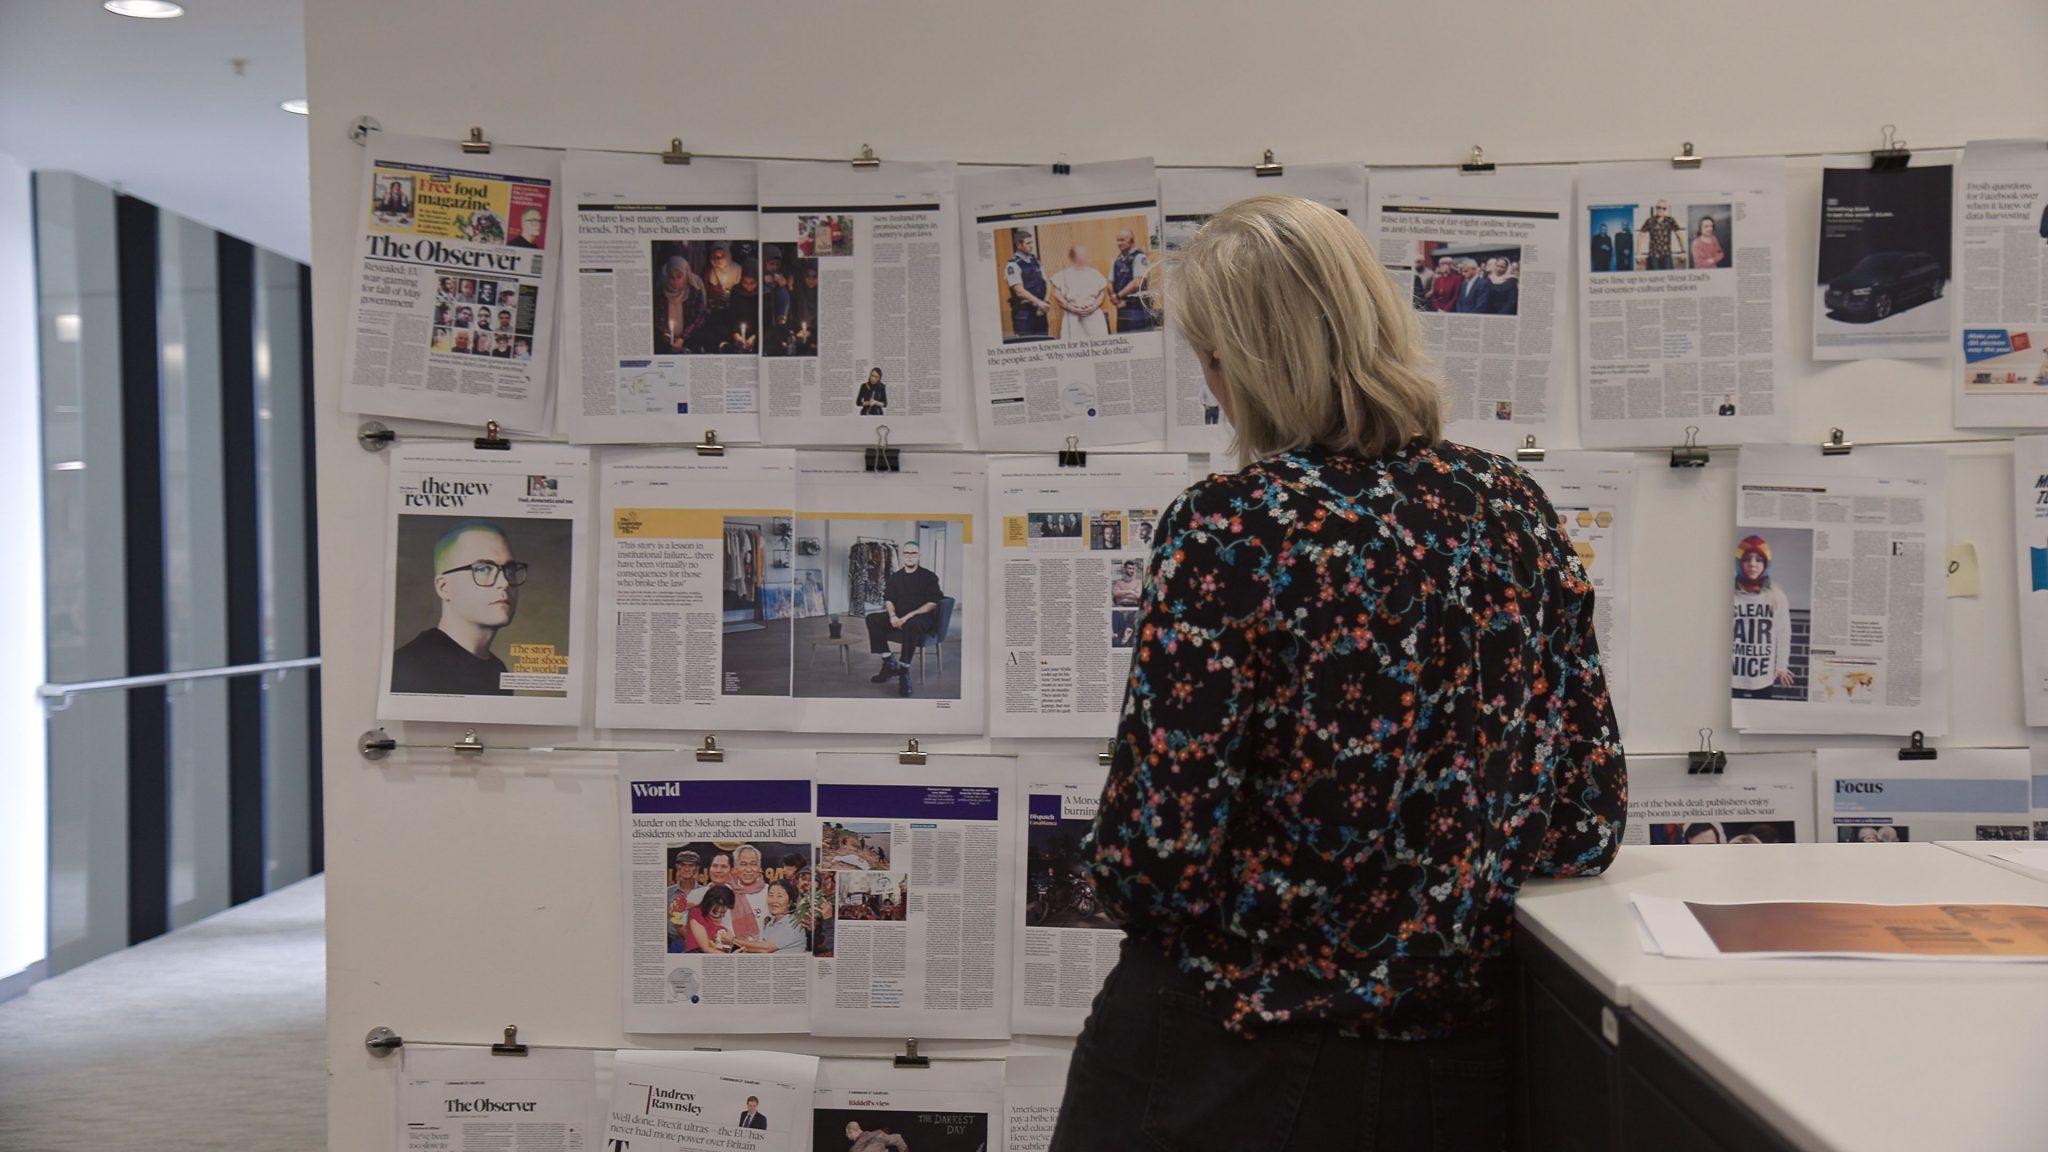 Netflix's documentary on the Cambridge Analytica scandal looks like